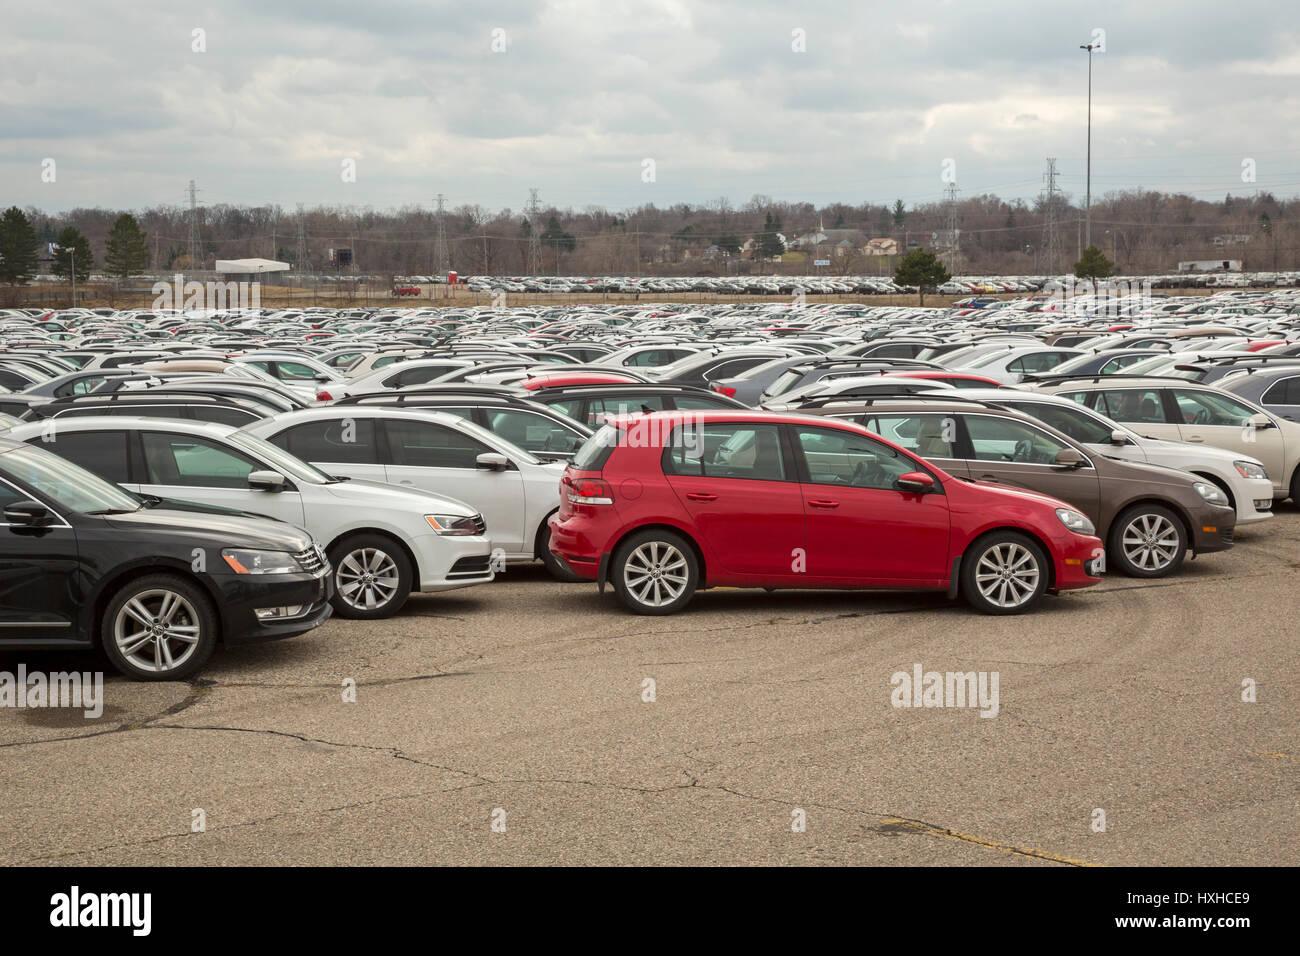 Volkswagen Diesel Buyback >> Pontiac, Michigan - Thousands of Volkswagen diesel vehicles are Stock Photo, Royalty Free Image ...